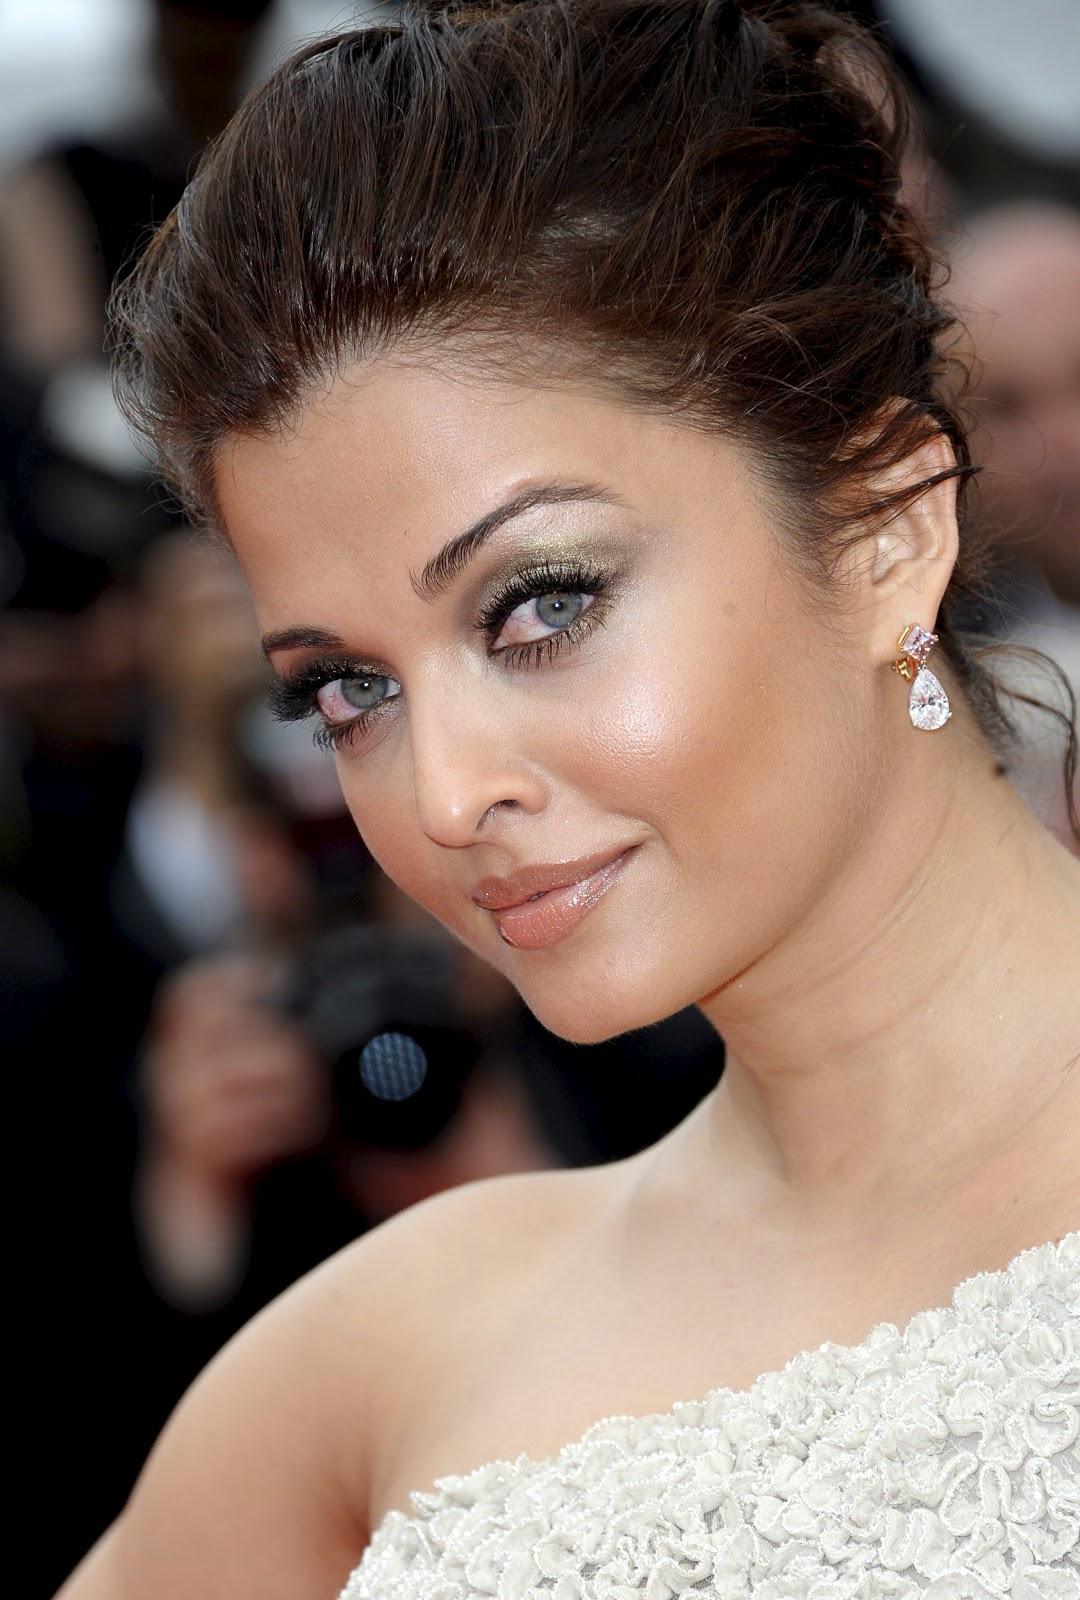 Dress4Cutelady  Cannes Dresses-Aishwarya rai dressese 02eed6a09